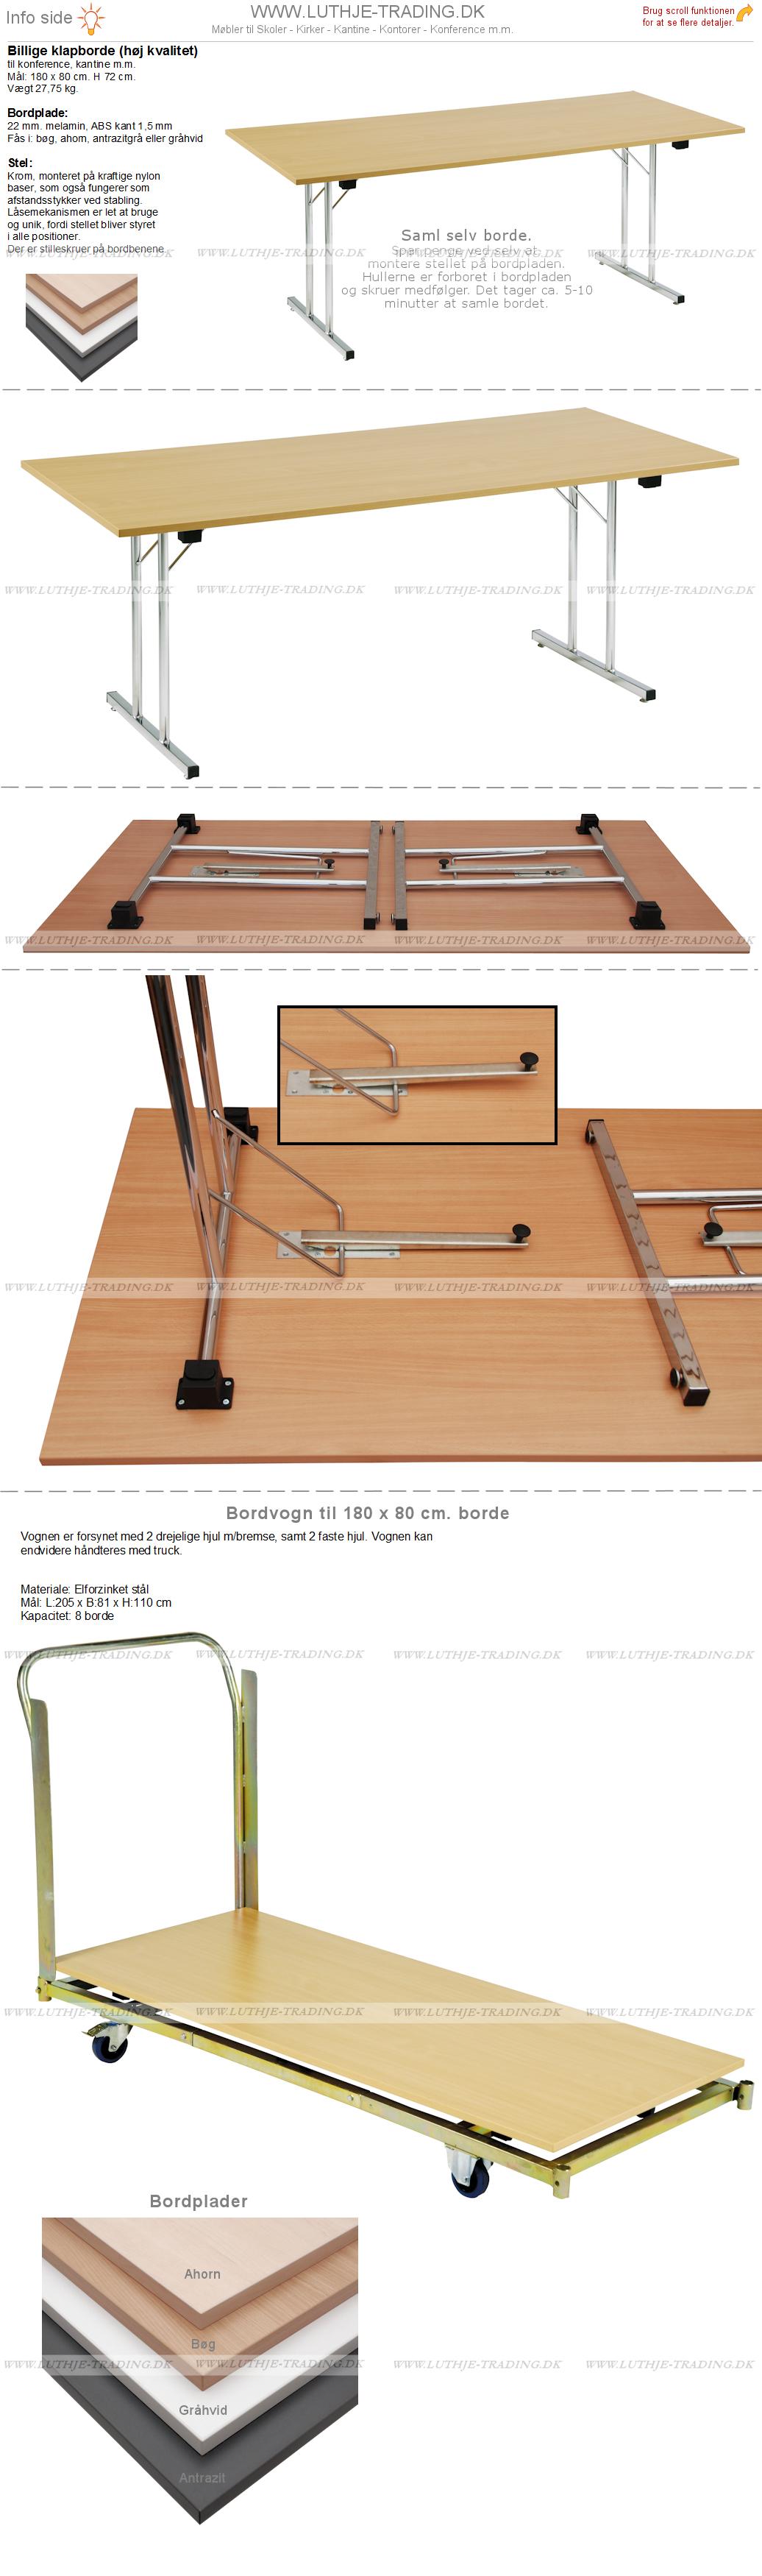 Billige klapborde 180 x 80 cm.